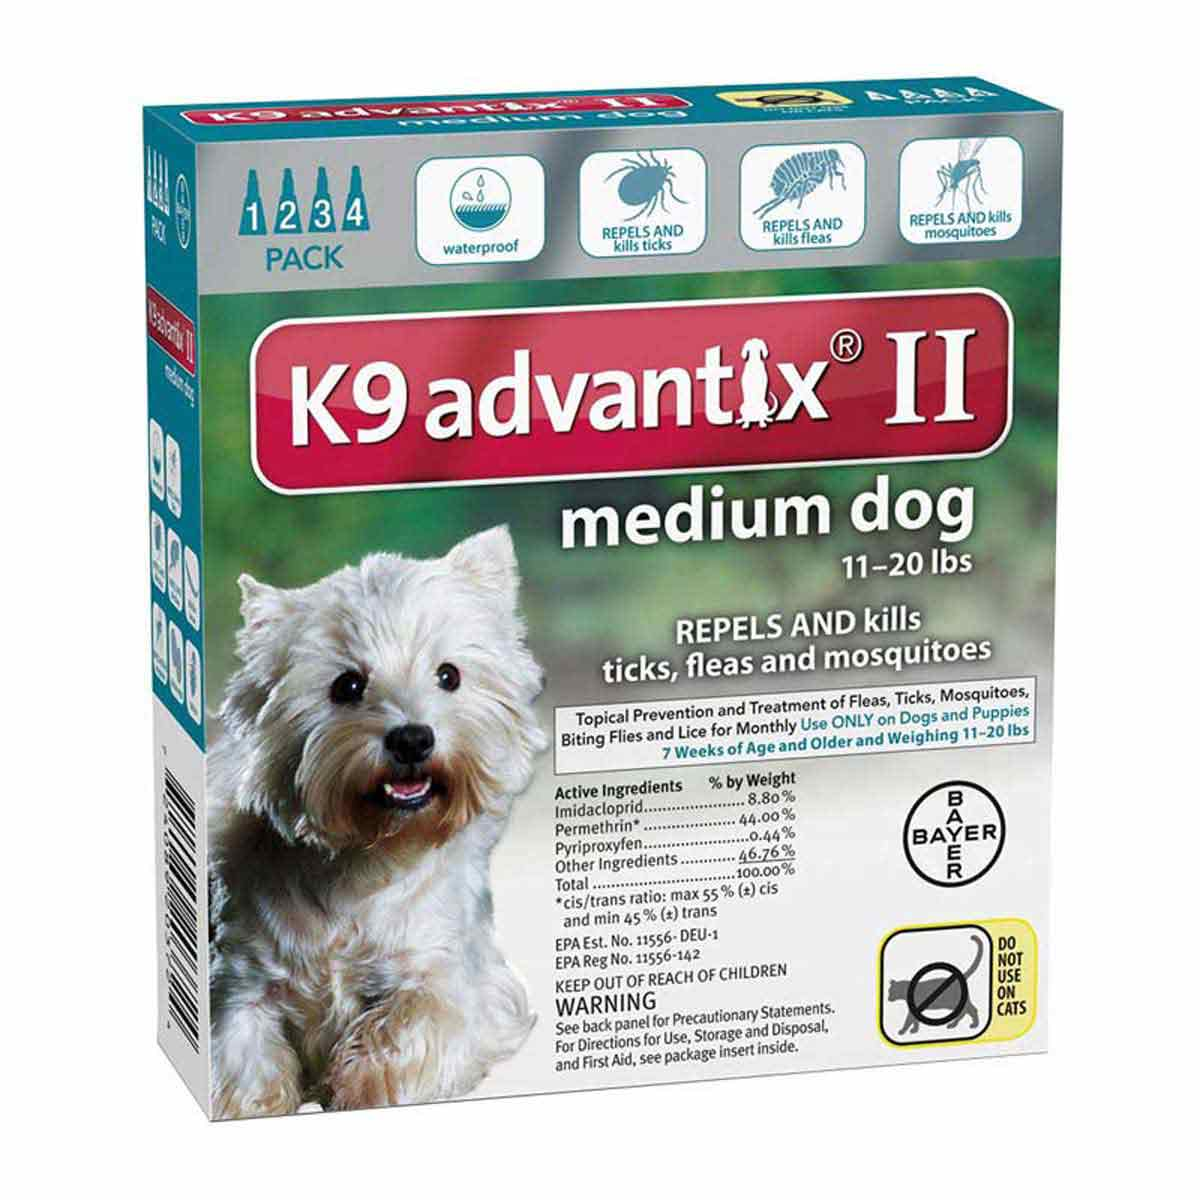 4 Pack of K9 Advantix II Teal Flea Treatment for Dogs 11-20 lbs